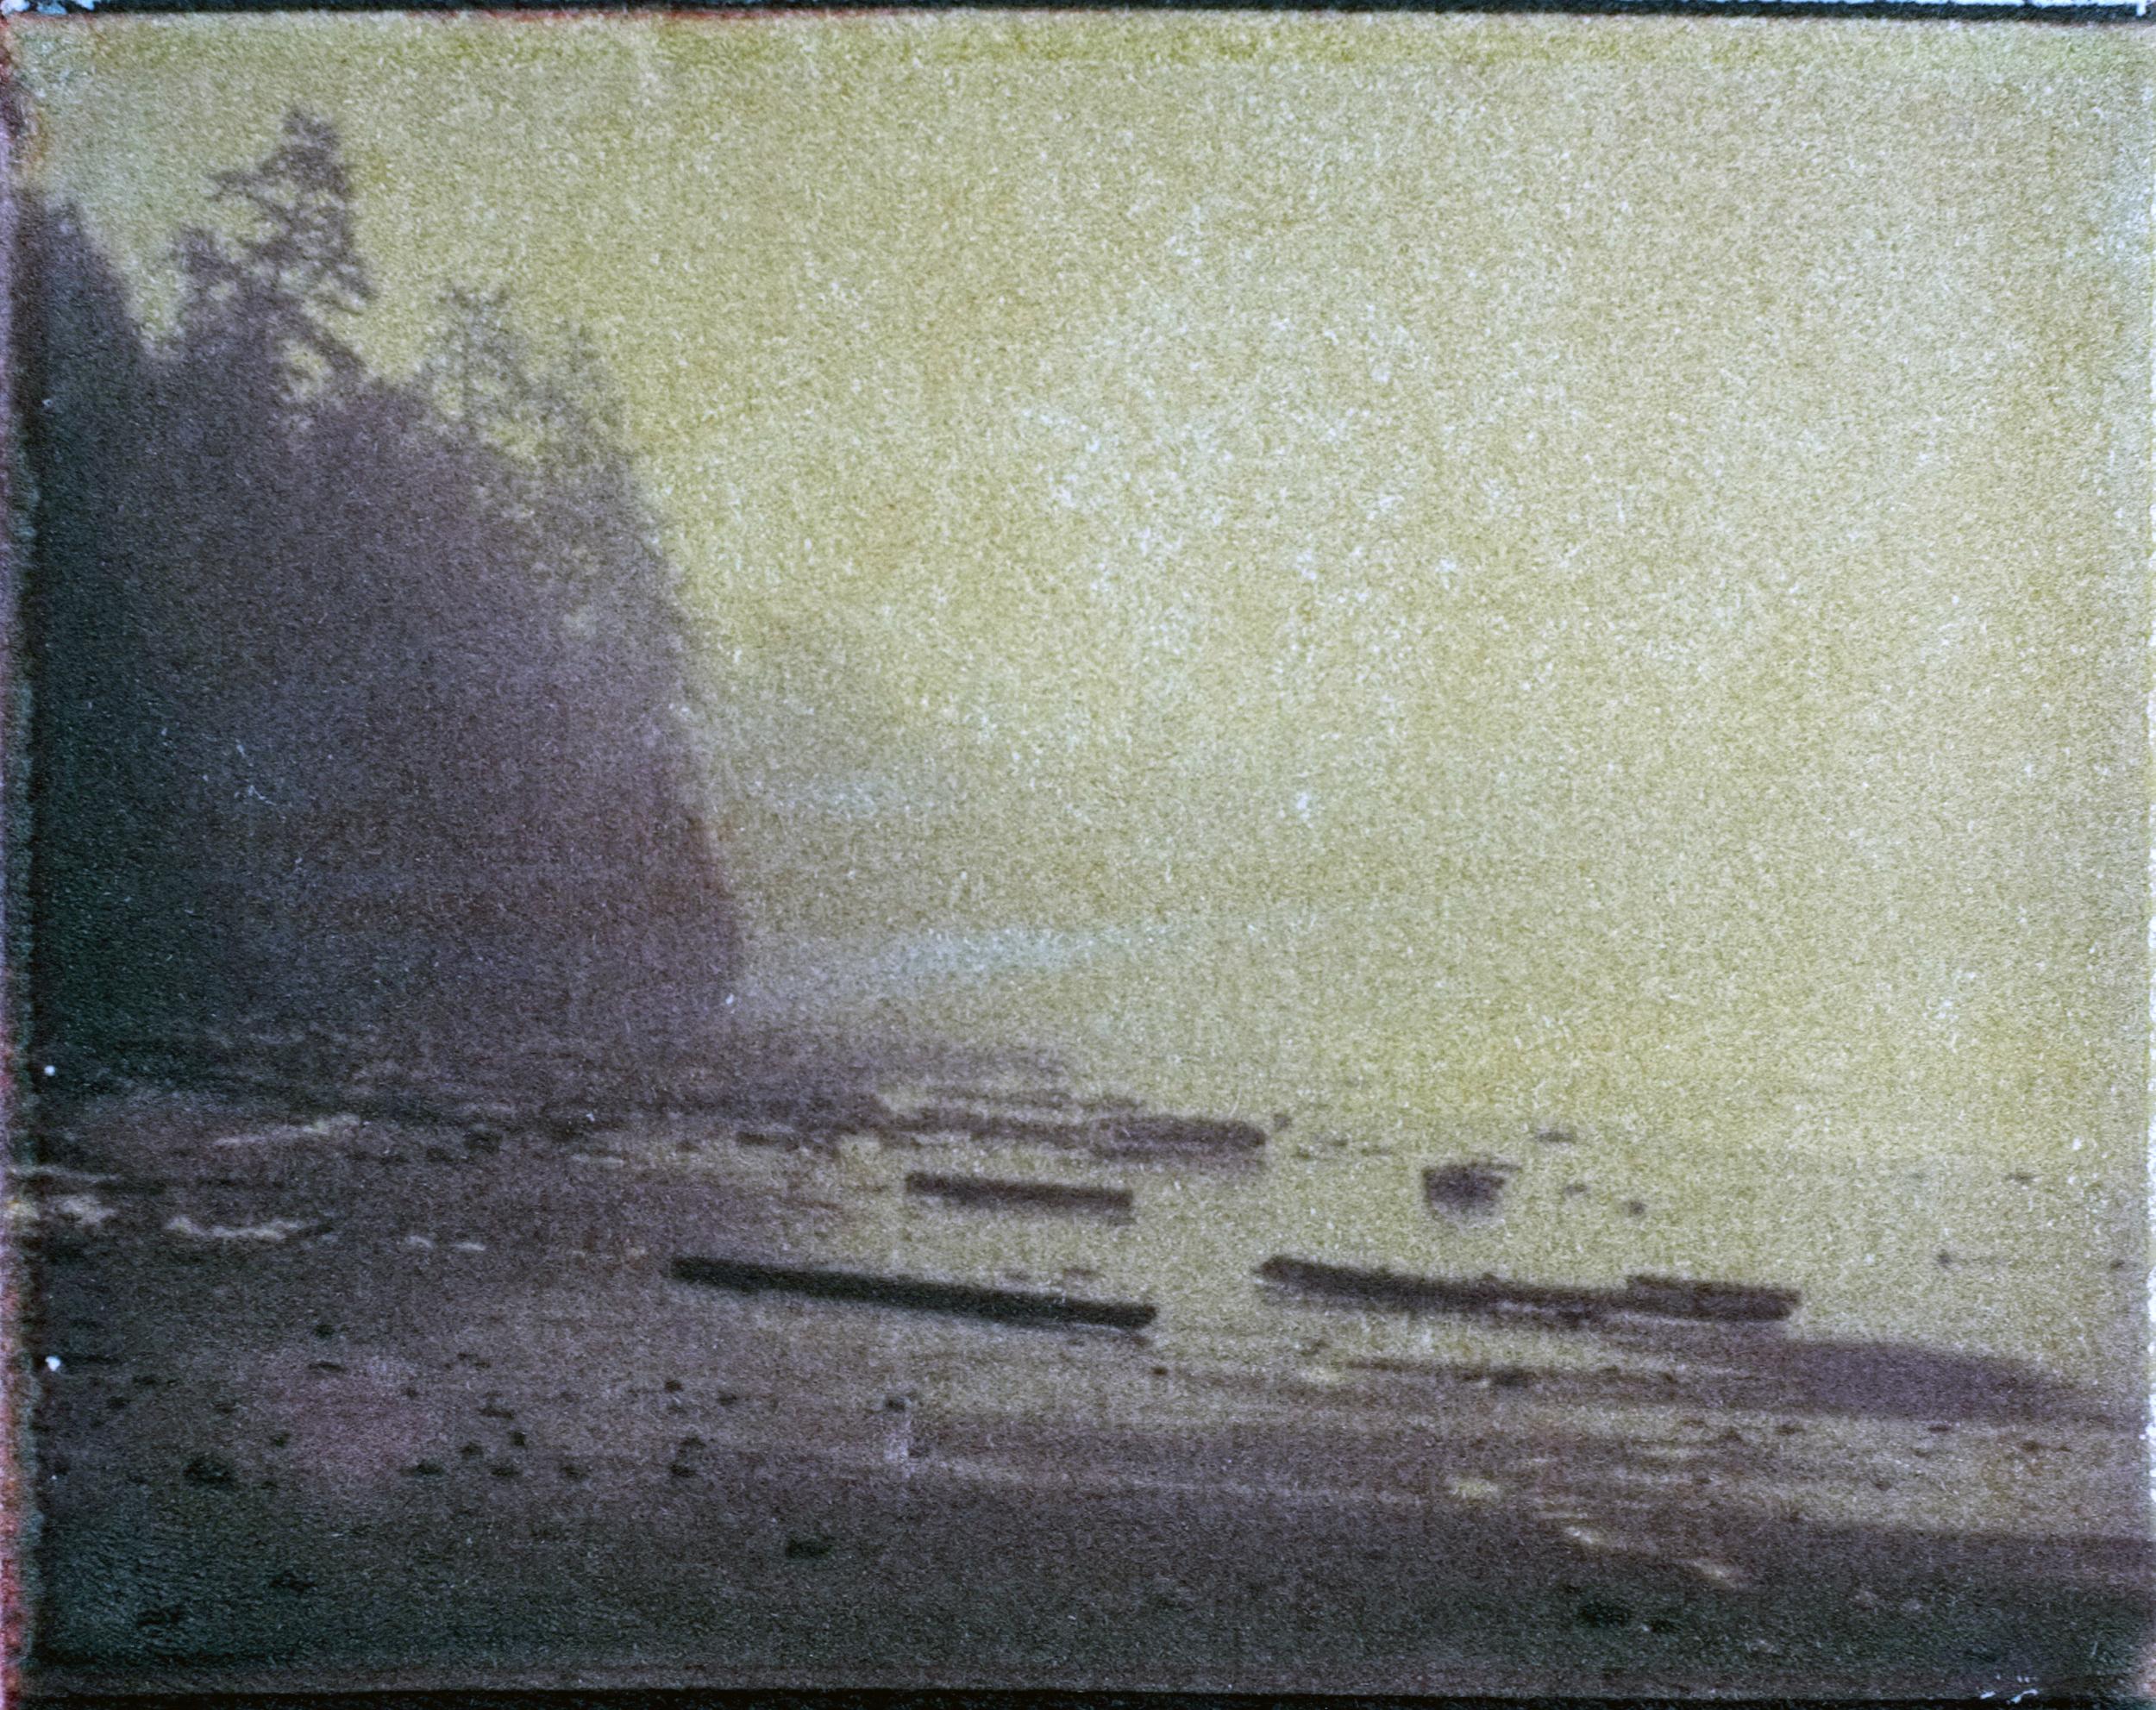 Memories of the Sea #8, Fiona Howarth.jpg